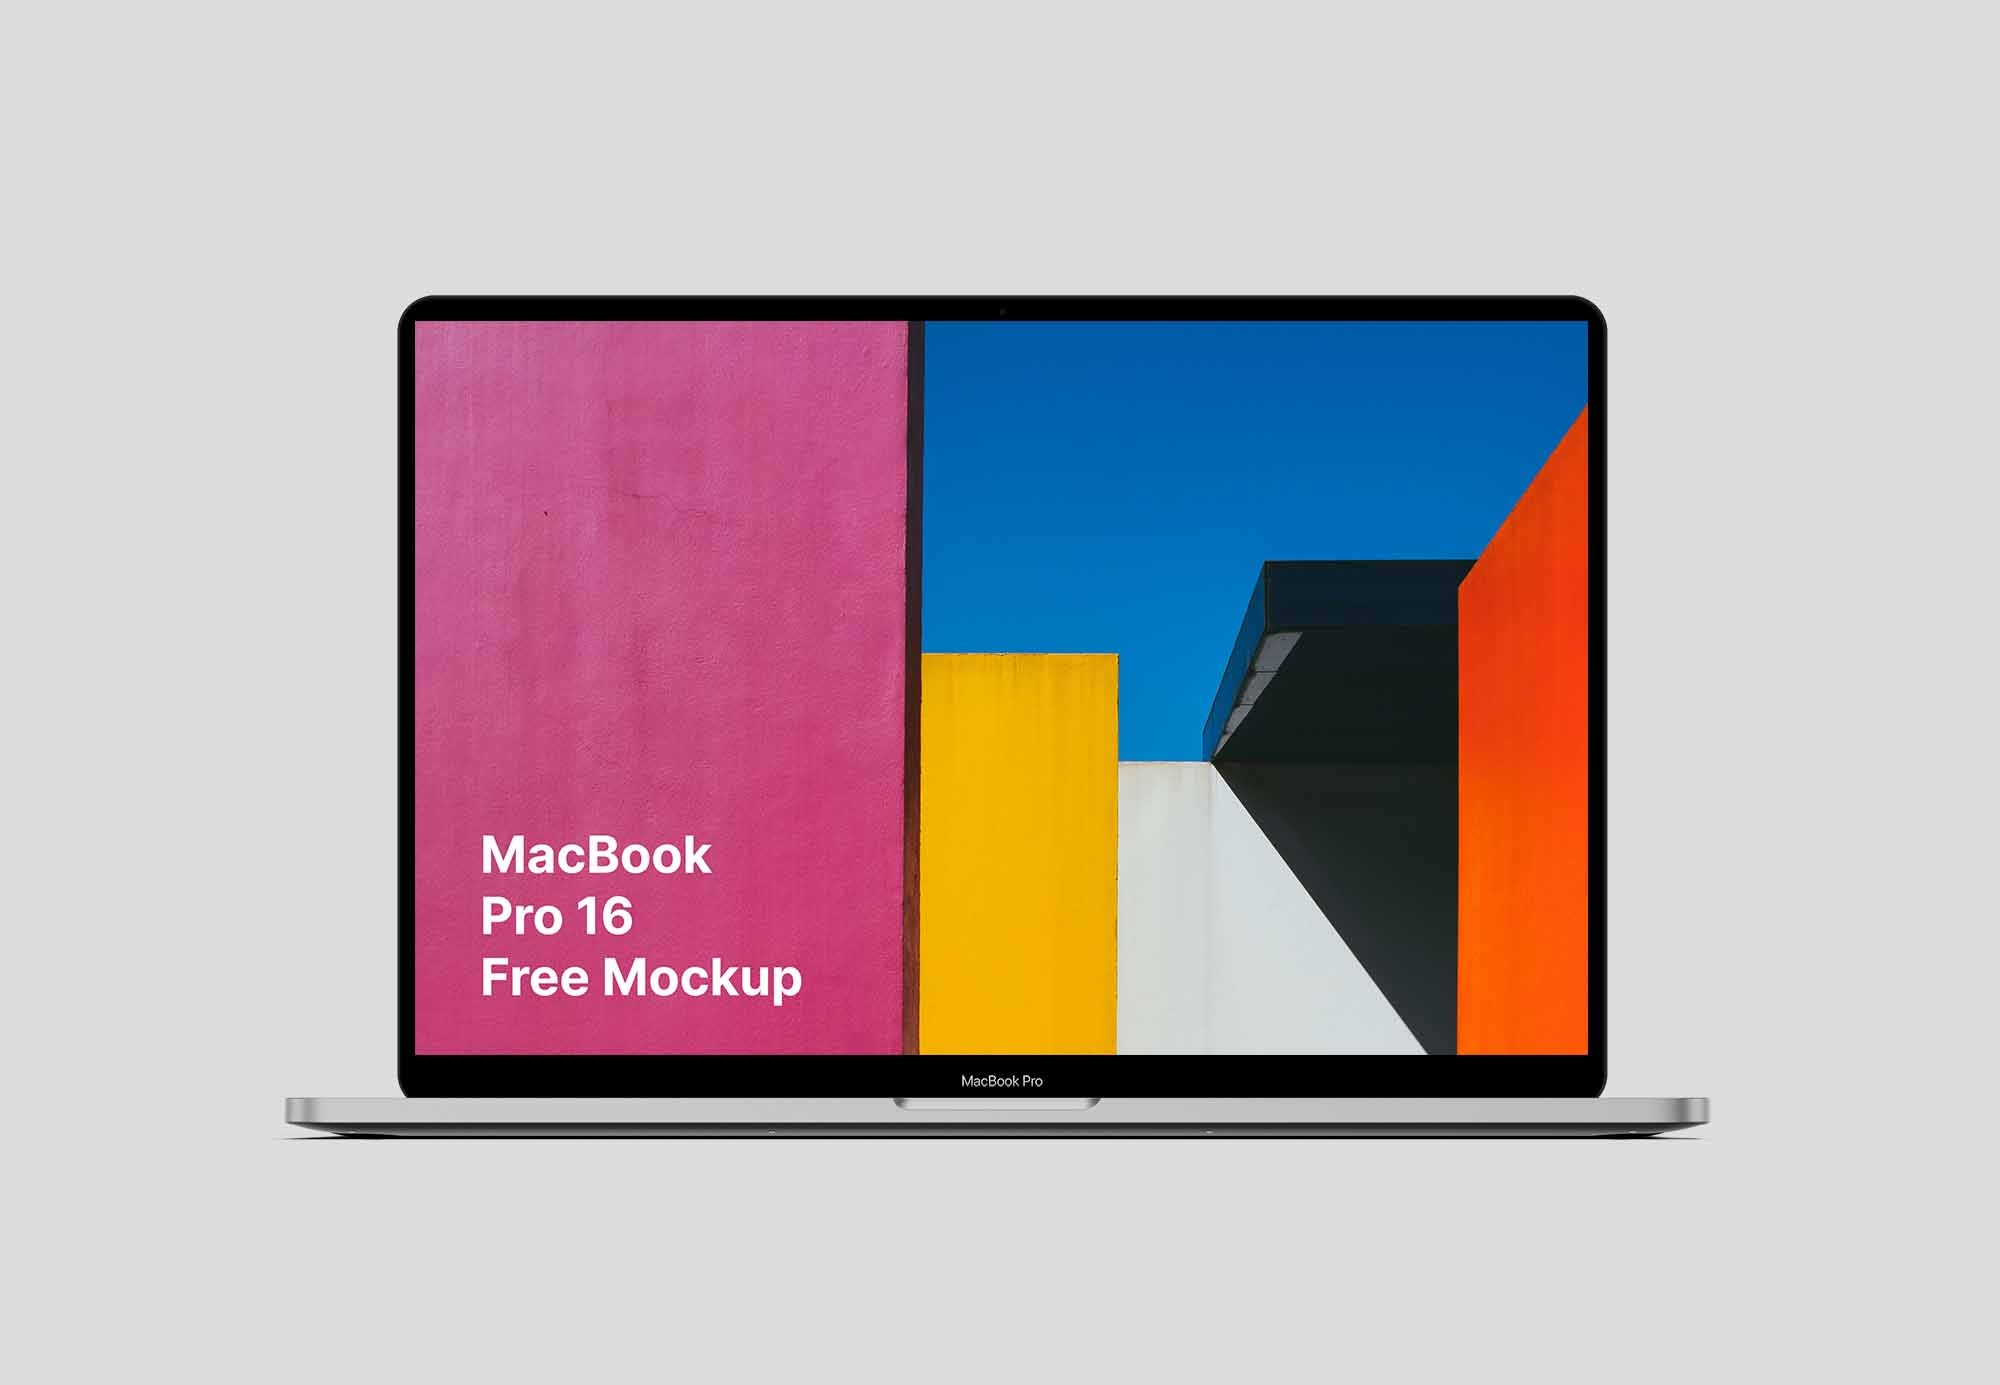 MacBook Pro 16 Mockup